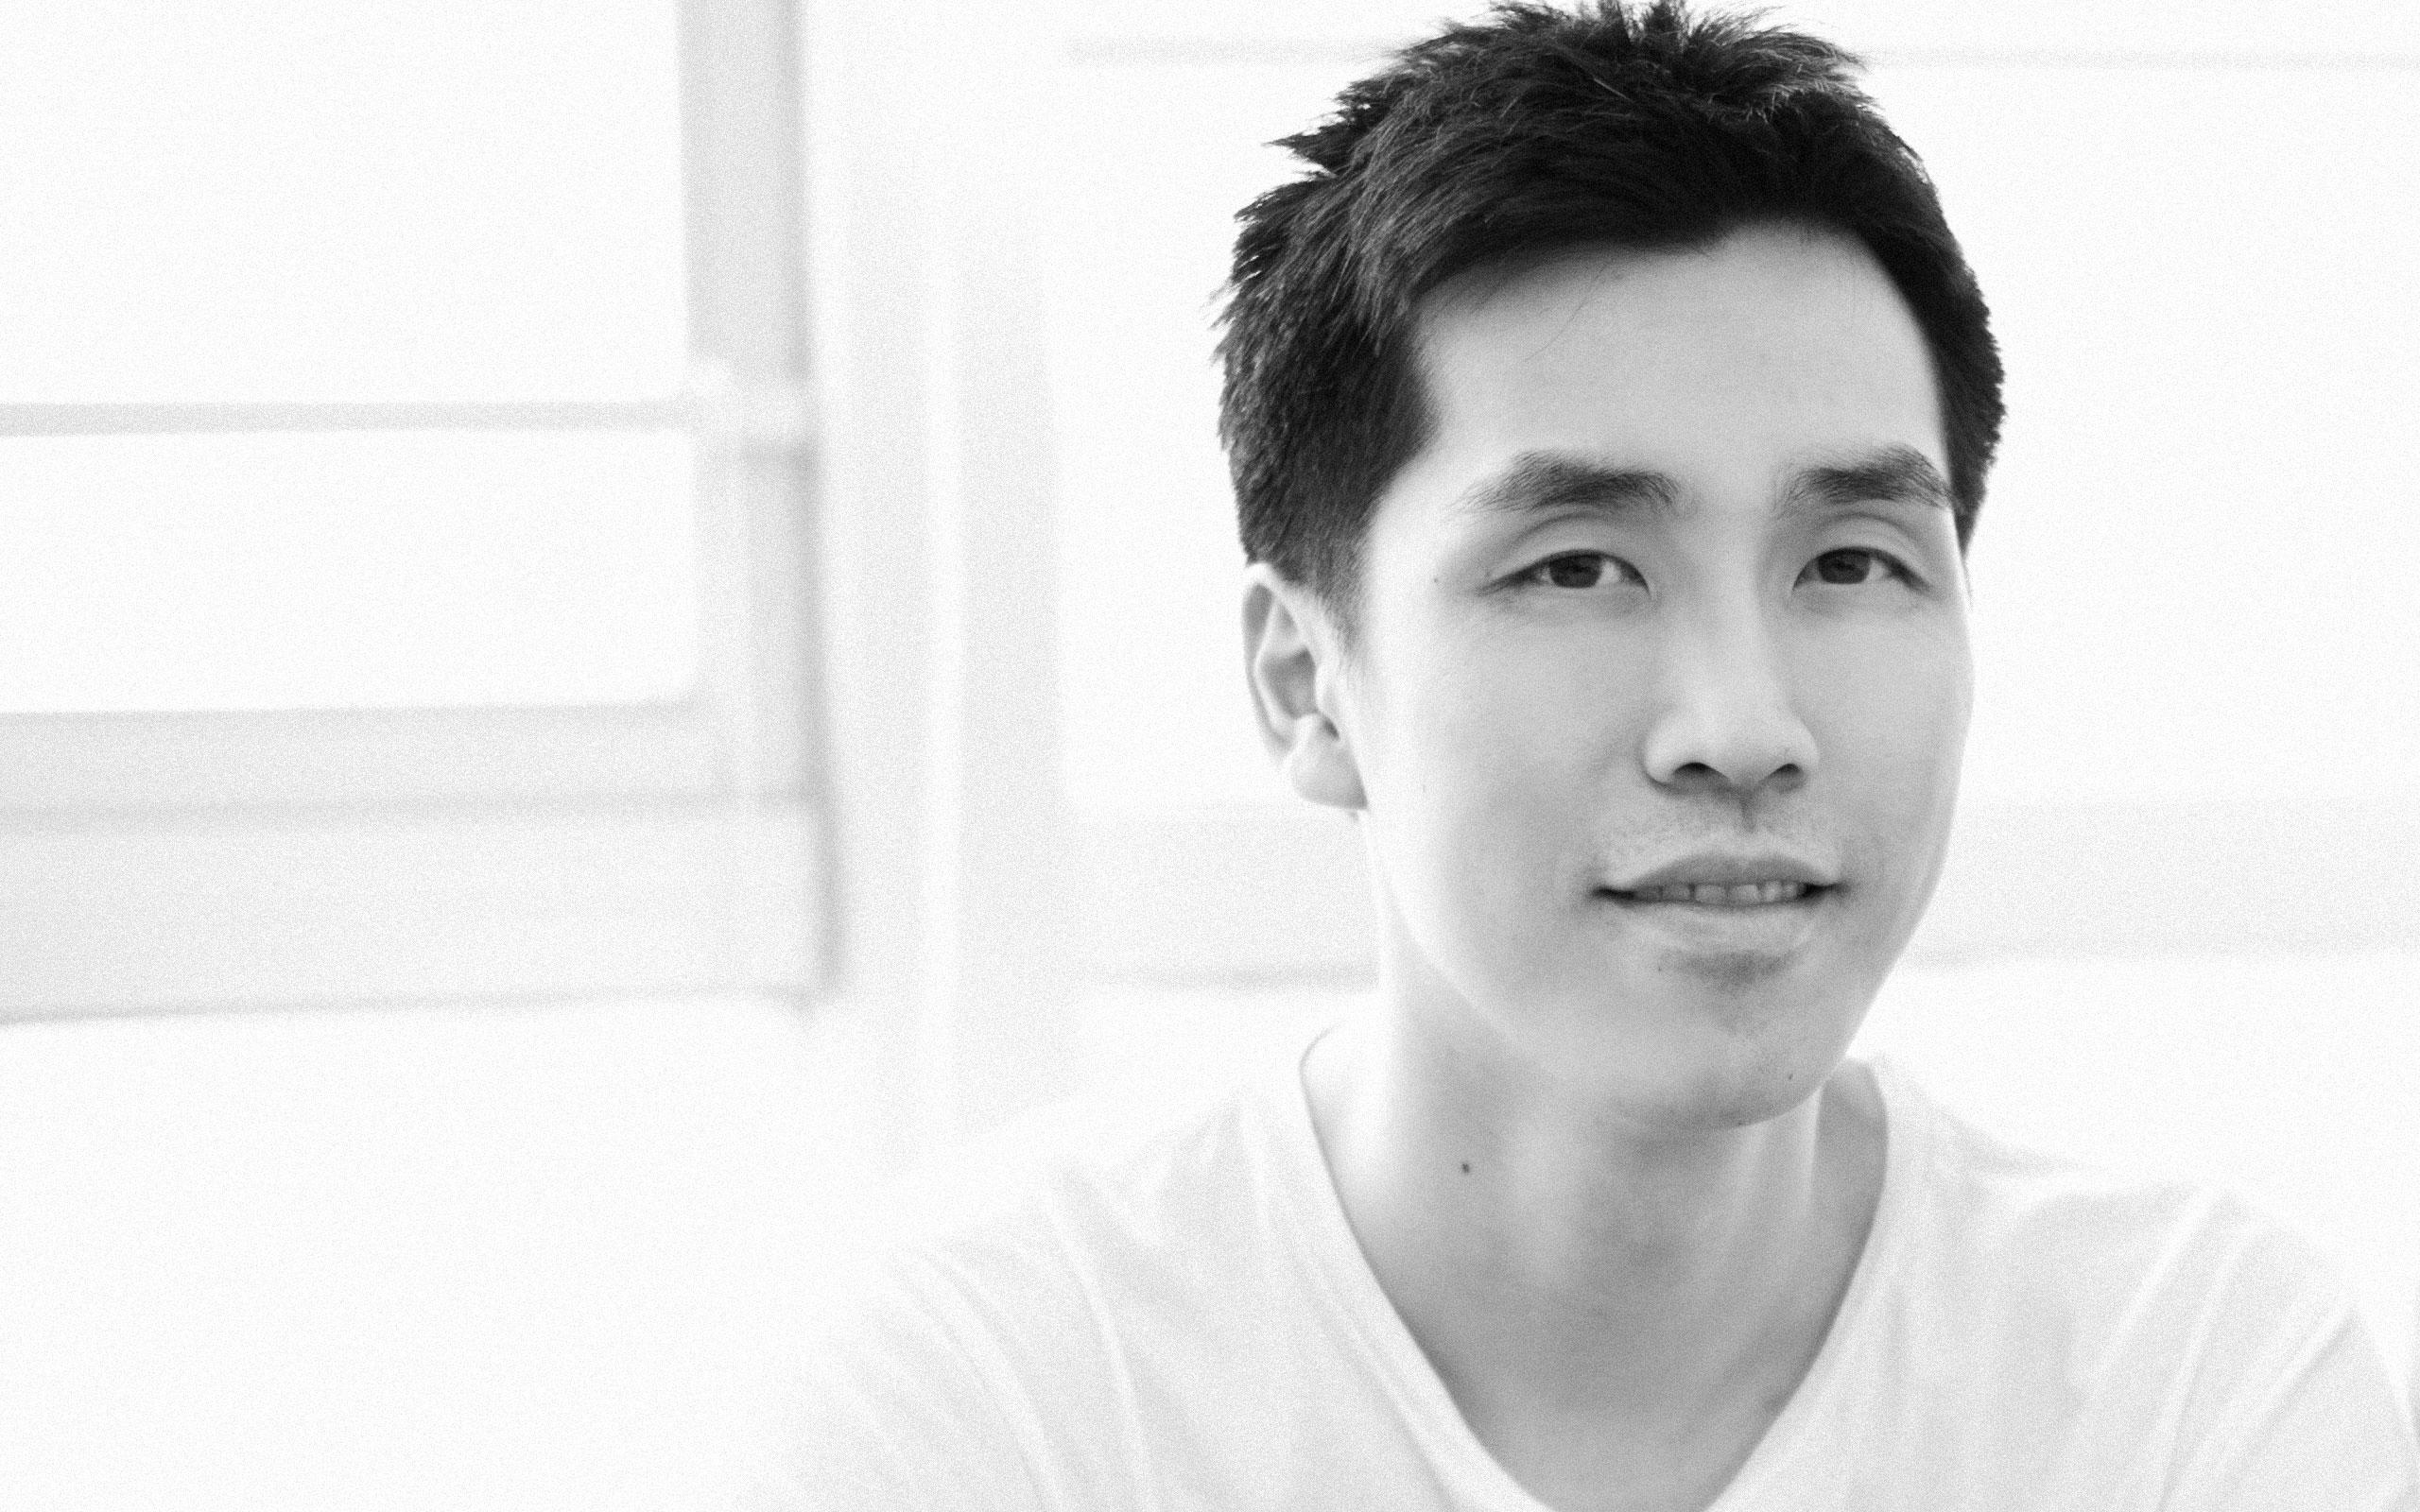 『Hypebeast (ハイプビースト) 』編集長 Kevin Ma (ケヴィン・マ) インタビュー